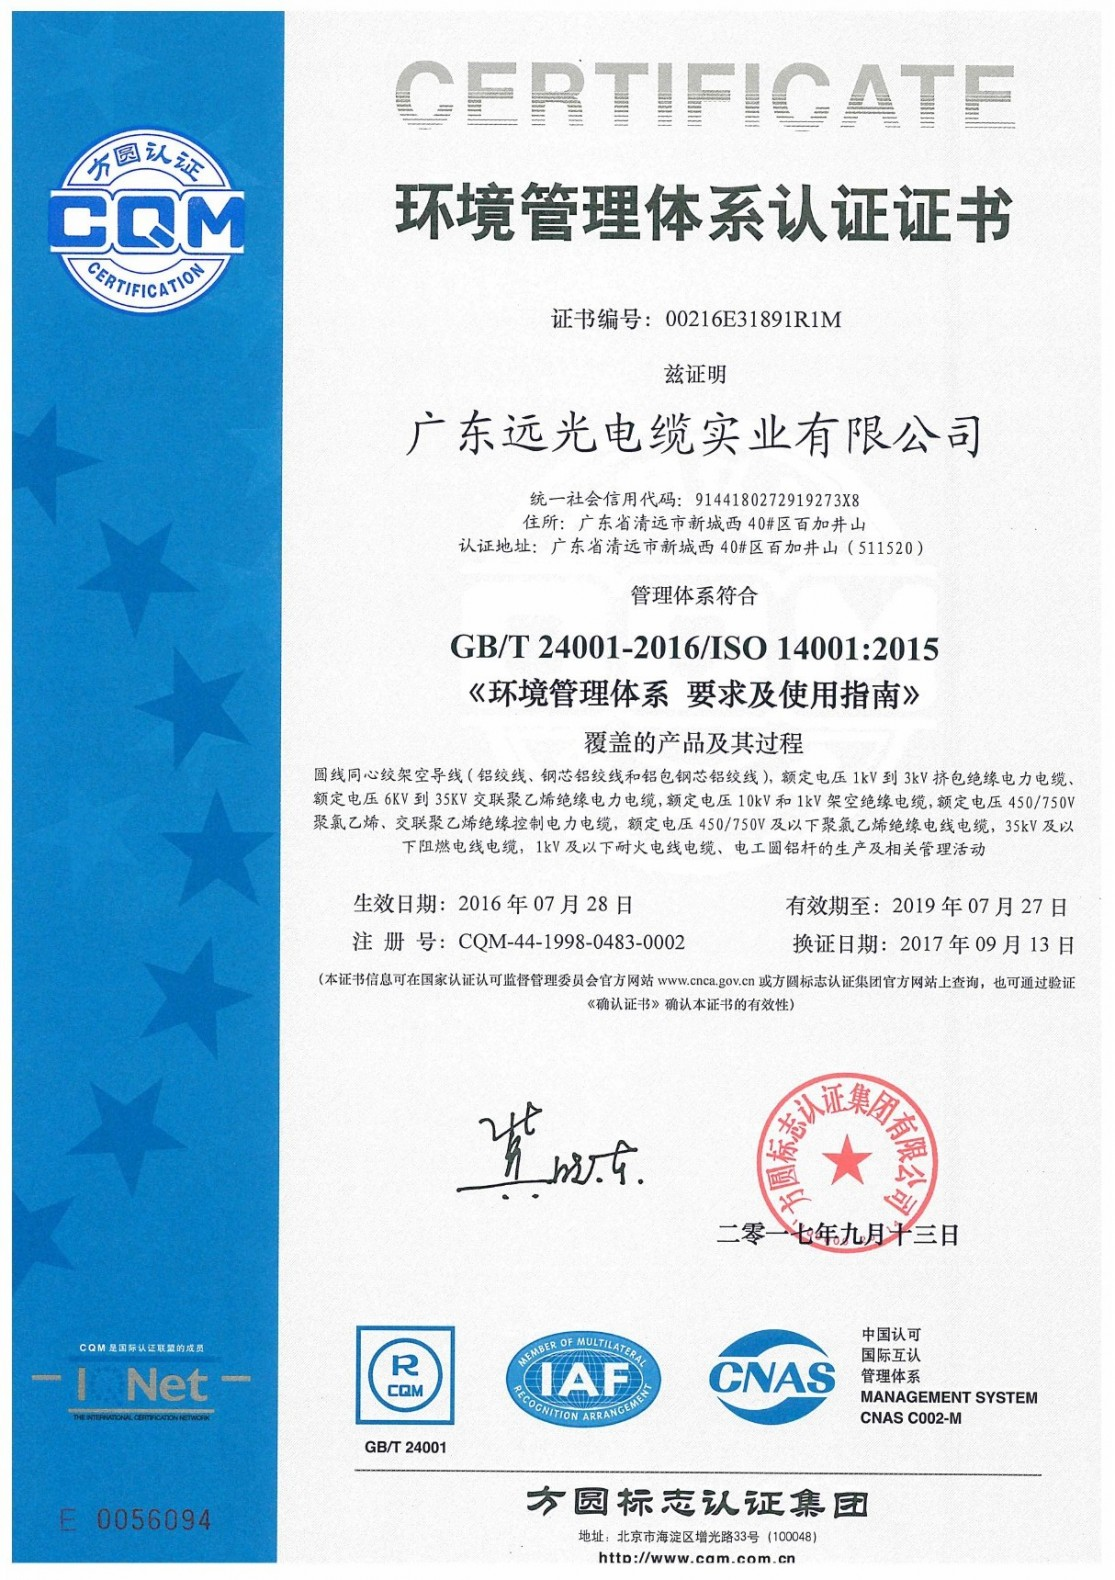 ISO14001环境管理体系认证证书-2004标准要求(中)